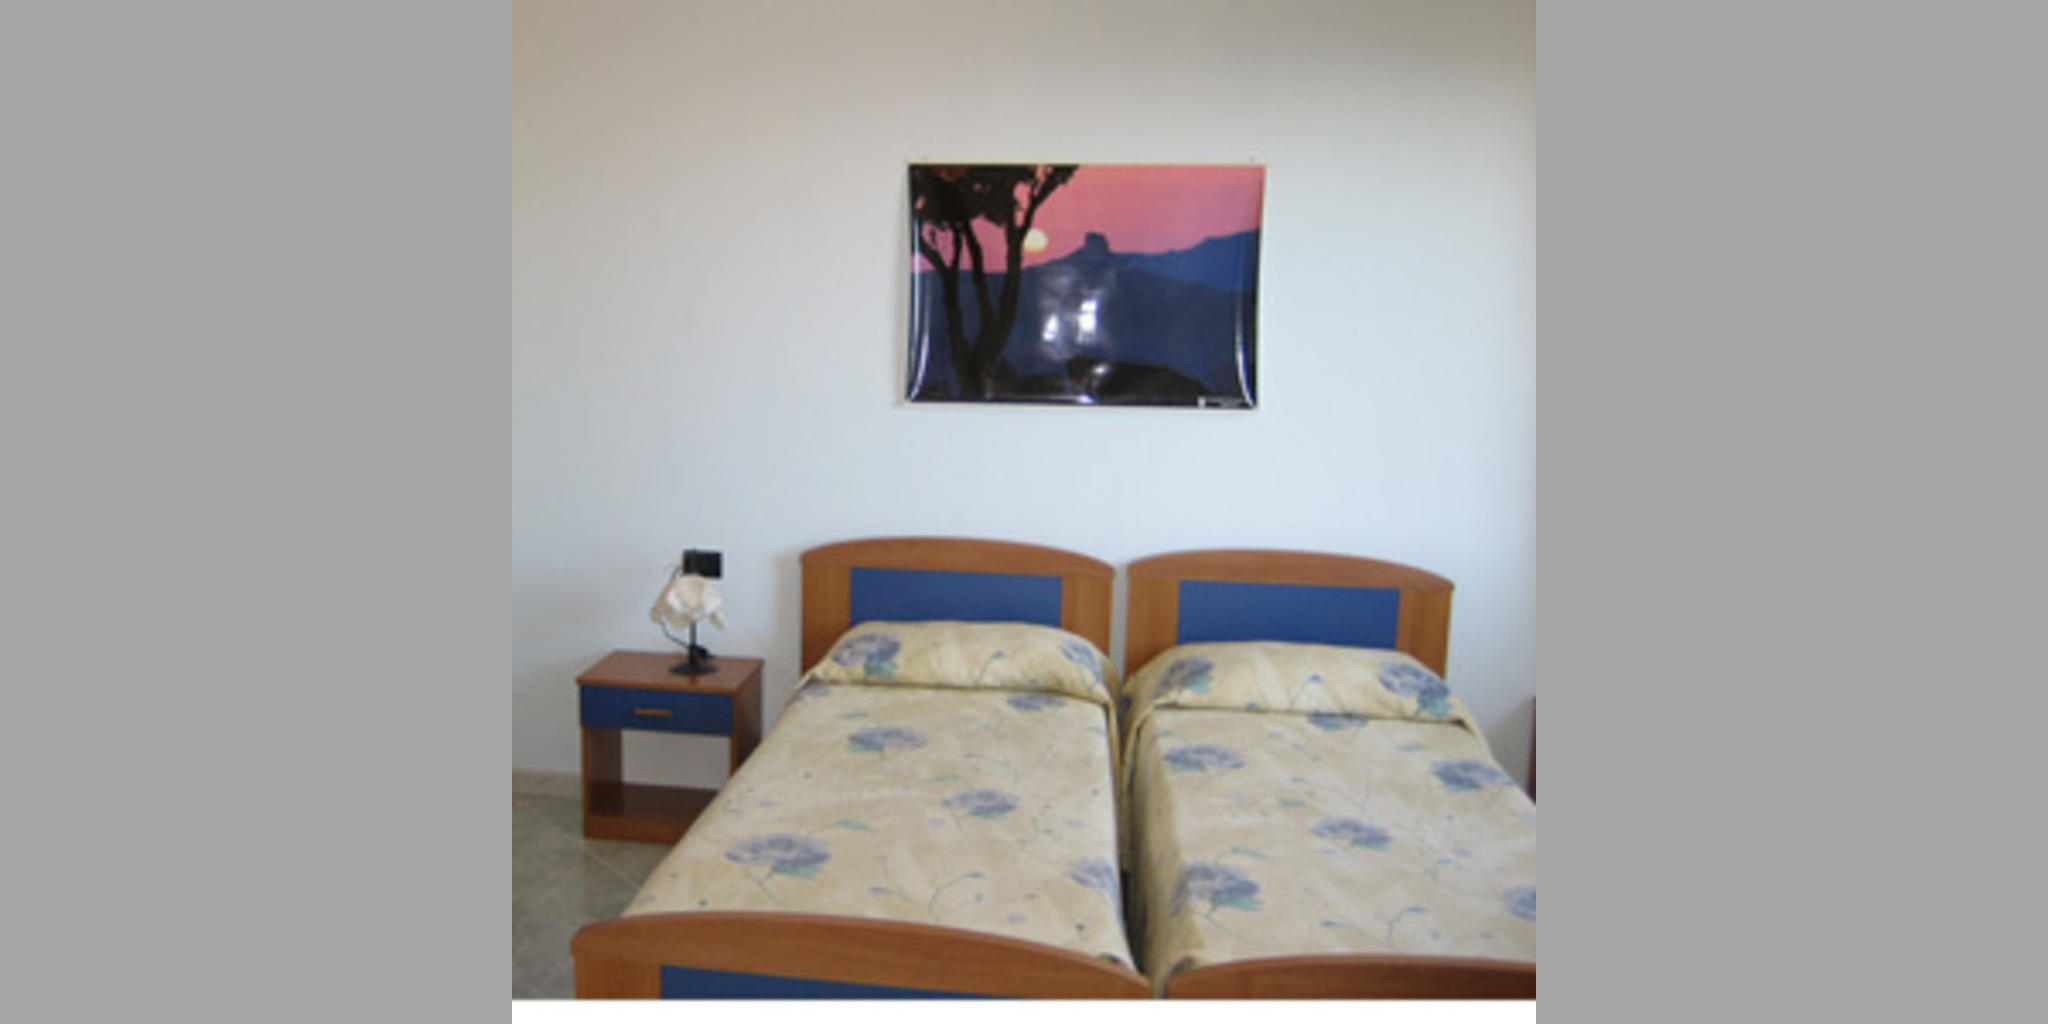 Bed & Breakfast Ilbono - San Cristoforo